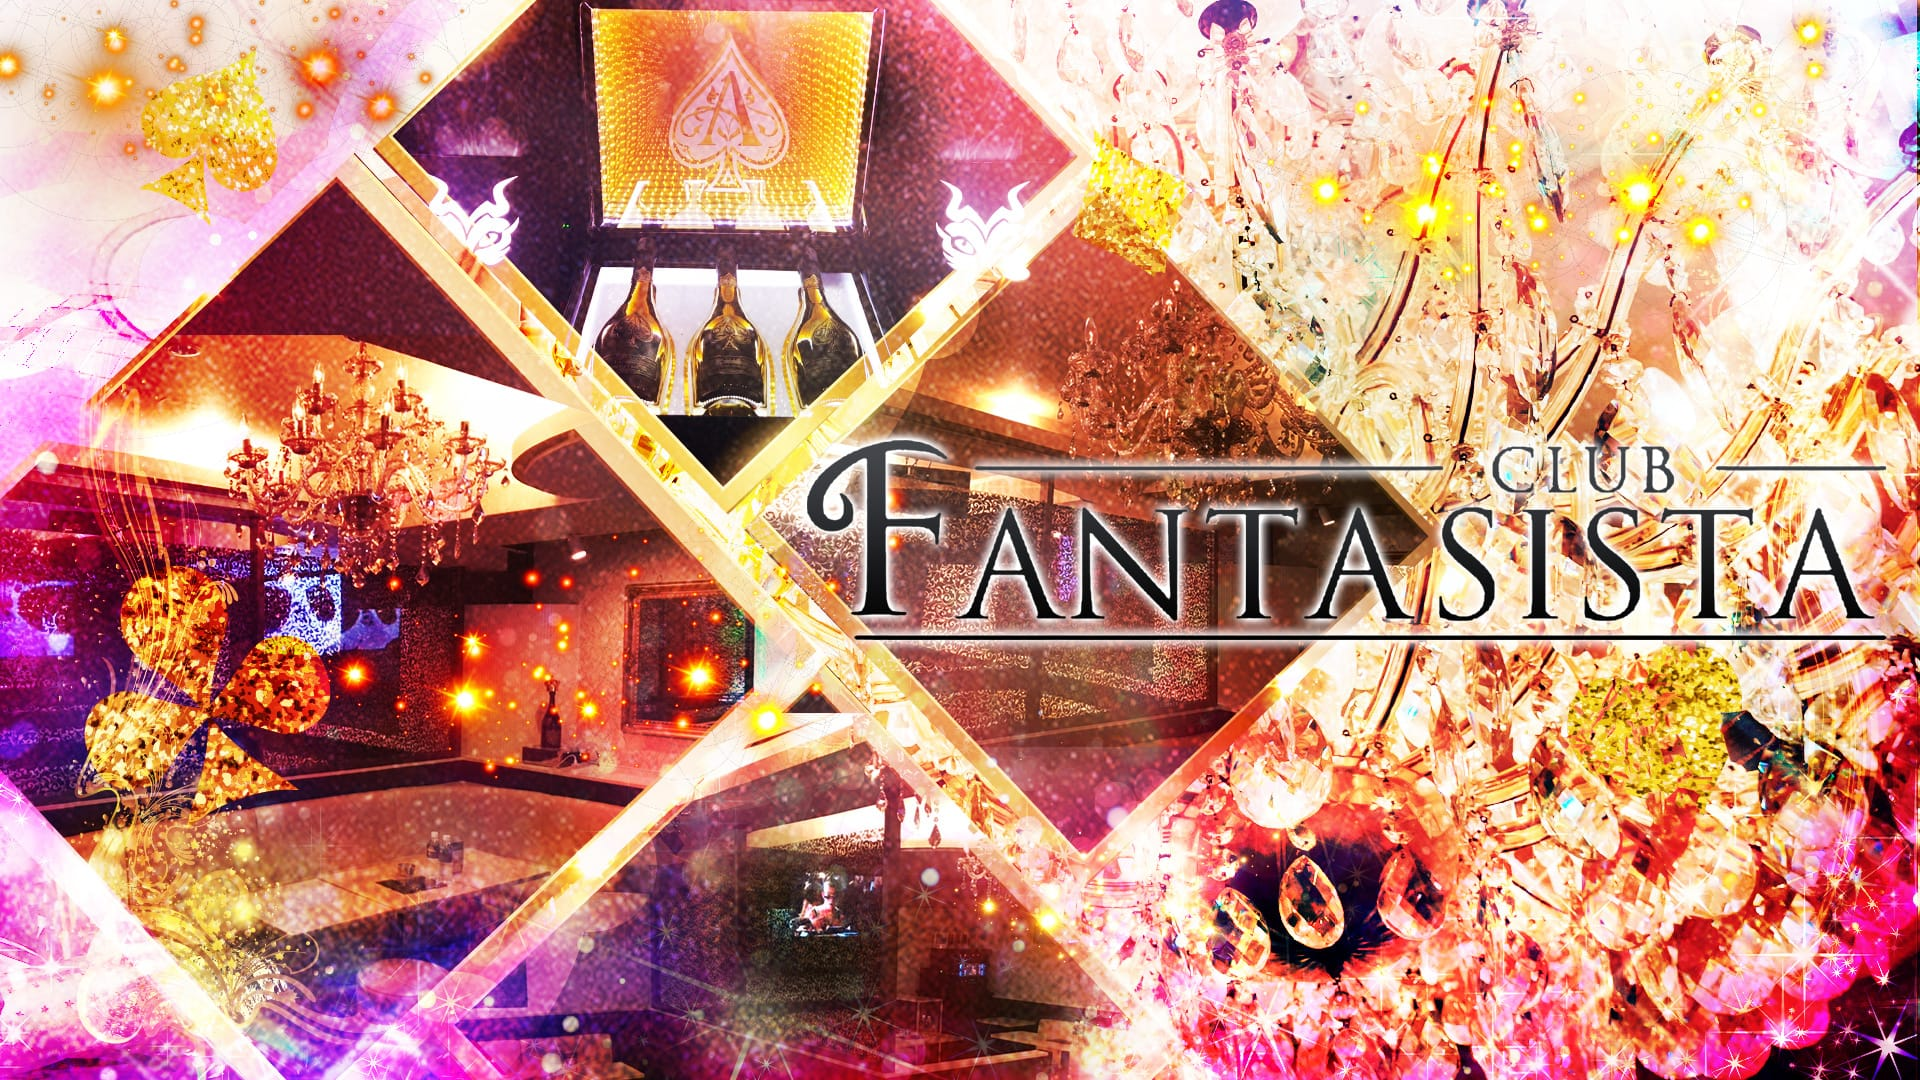 CLUB FANTASISTA(ファンタジスタ) 赤羽キャバクラ TOP画像